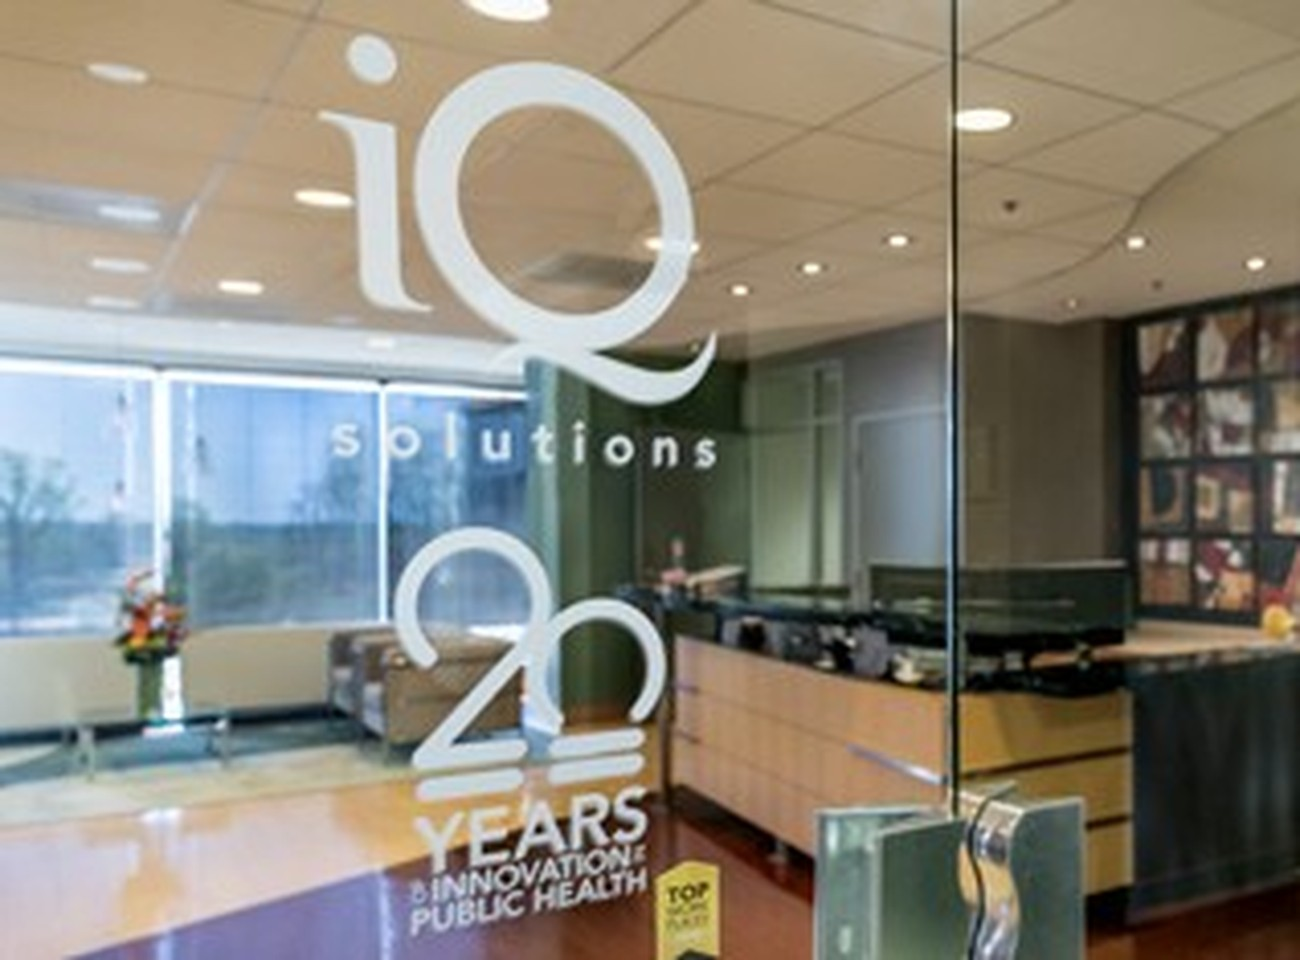 IQ Solutions Careers